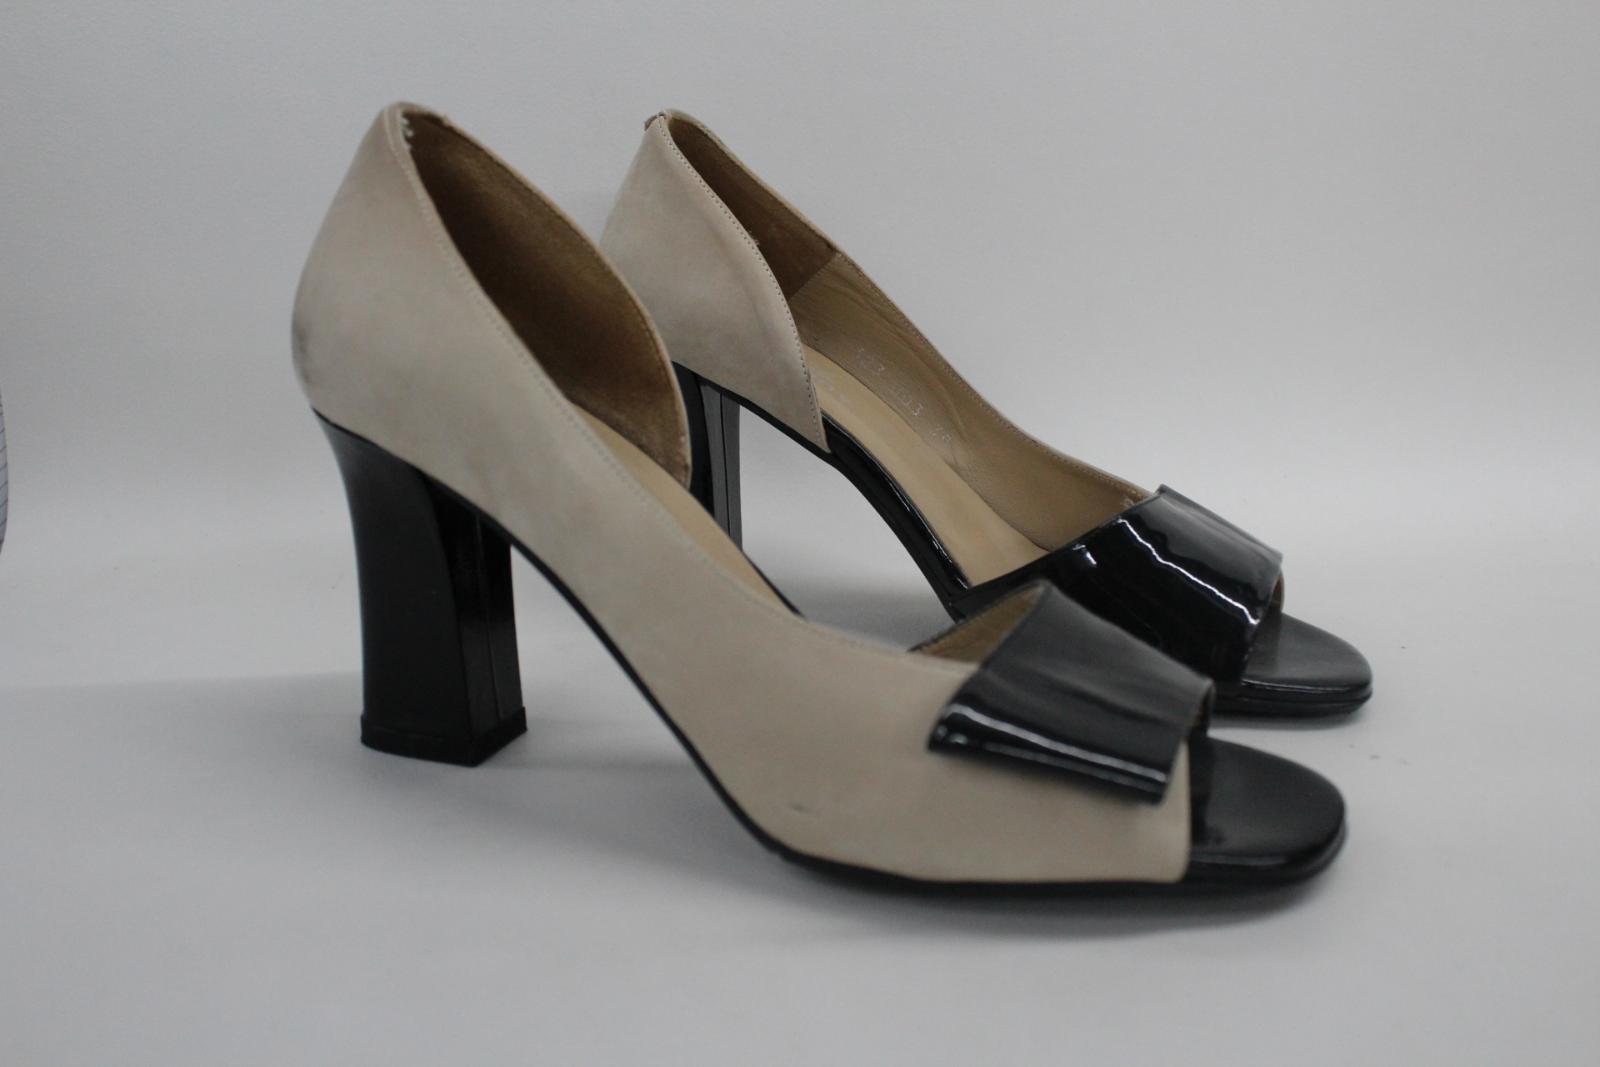 AUDLEY-London-Beige-Leather-Open-Peep-Toe-Bloc-Heel-Court-Shoes-EU39-UK6 thumbnail 2